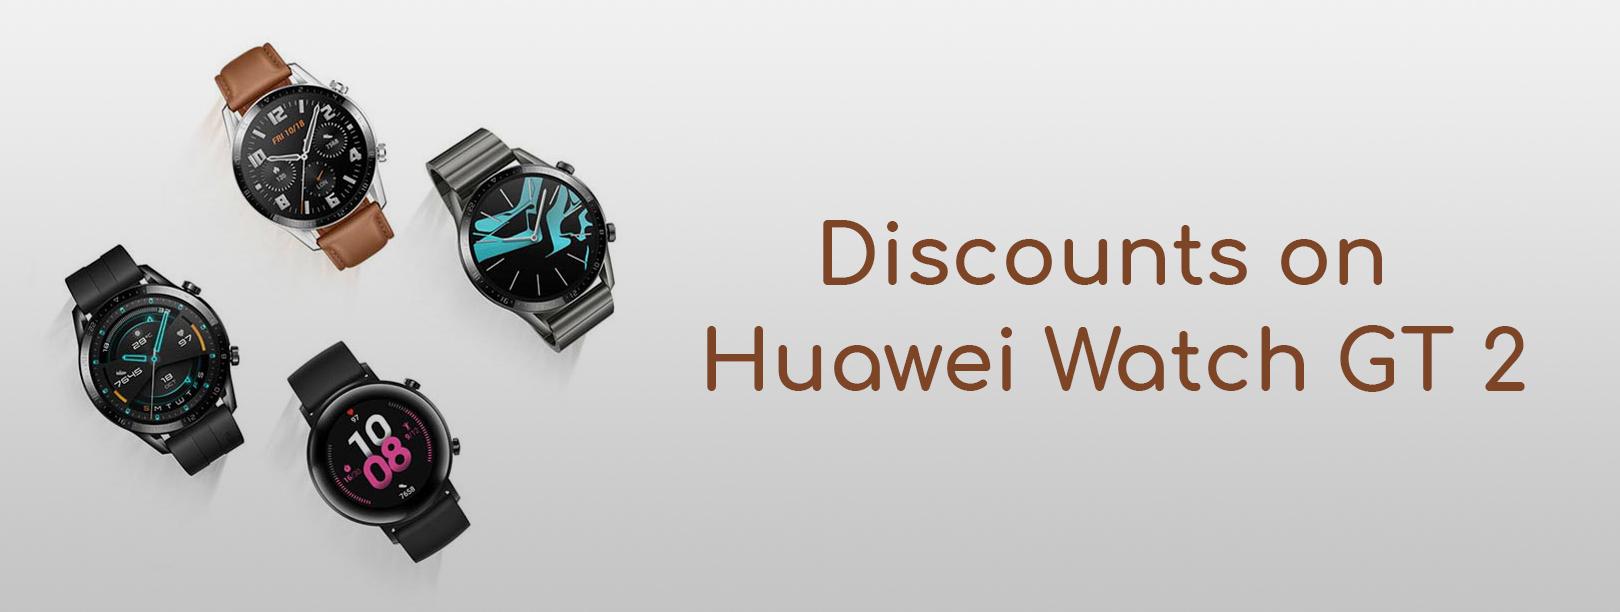 Flipkart Huawei Watch GT 2